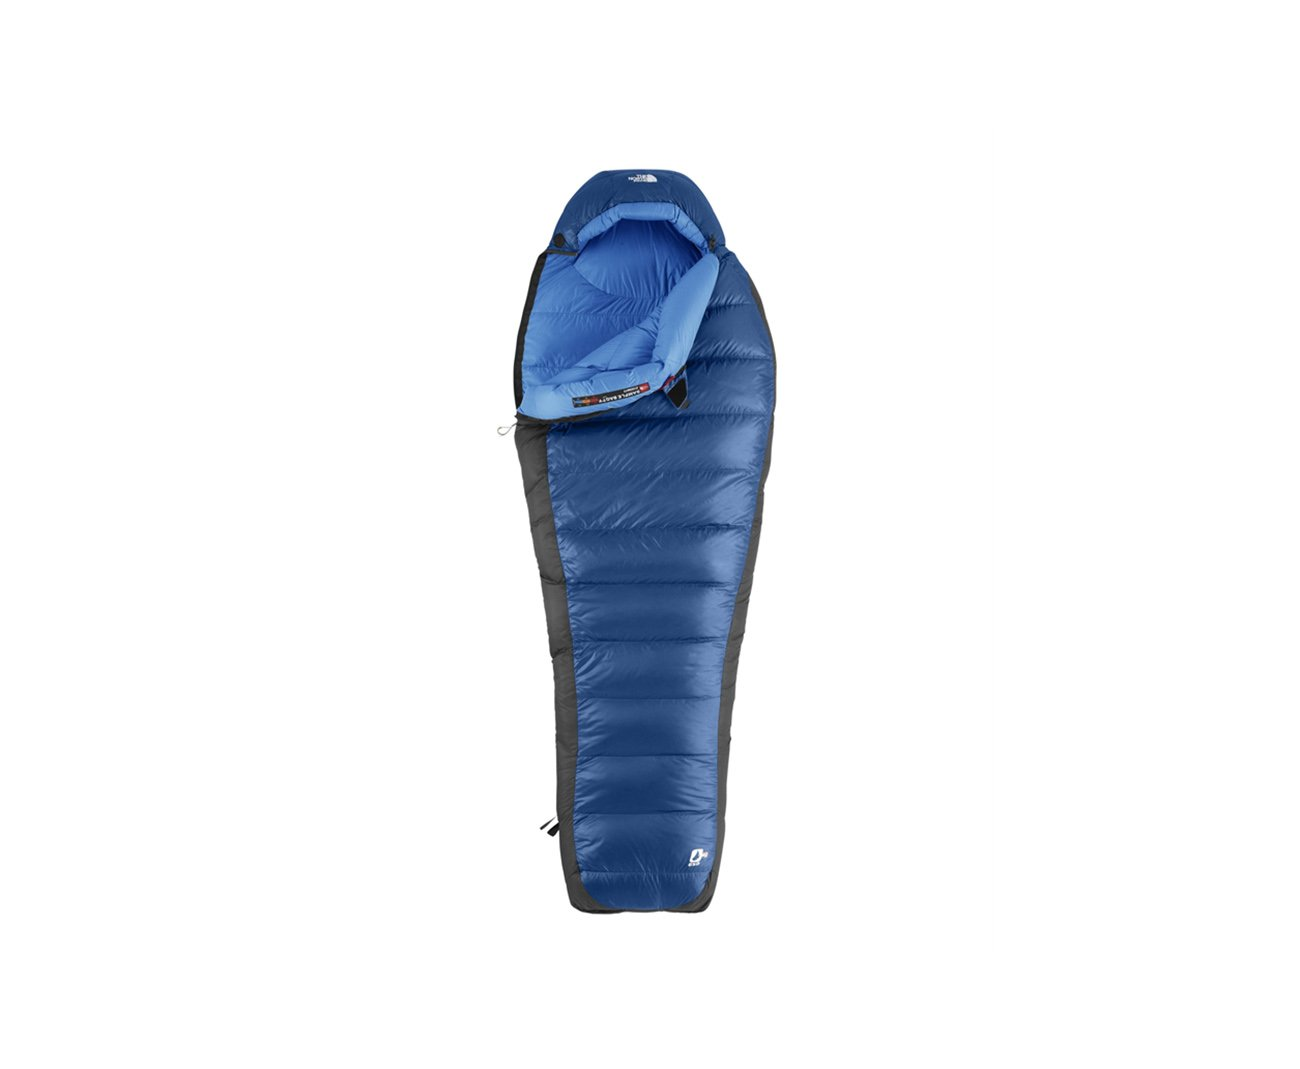 Saco De Dormir Blue Kazoo 15°f / -10°c Azul Ziper Lado Direito - The North Face